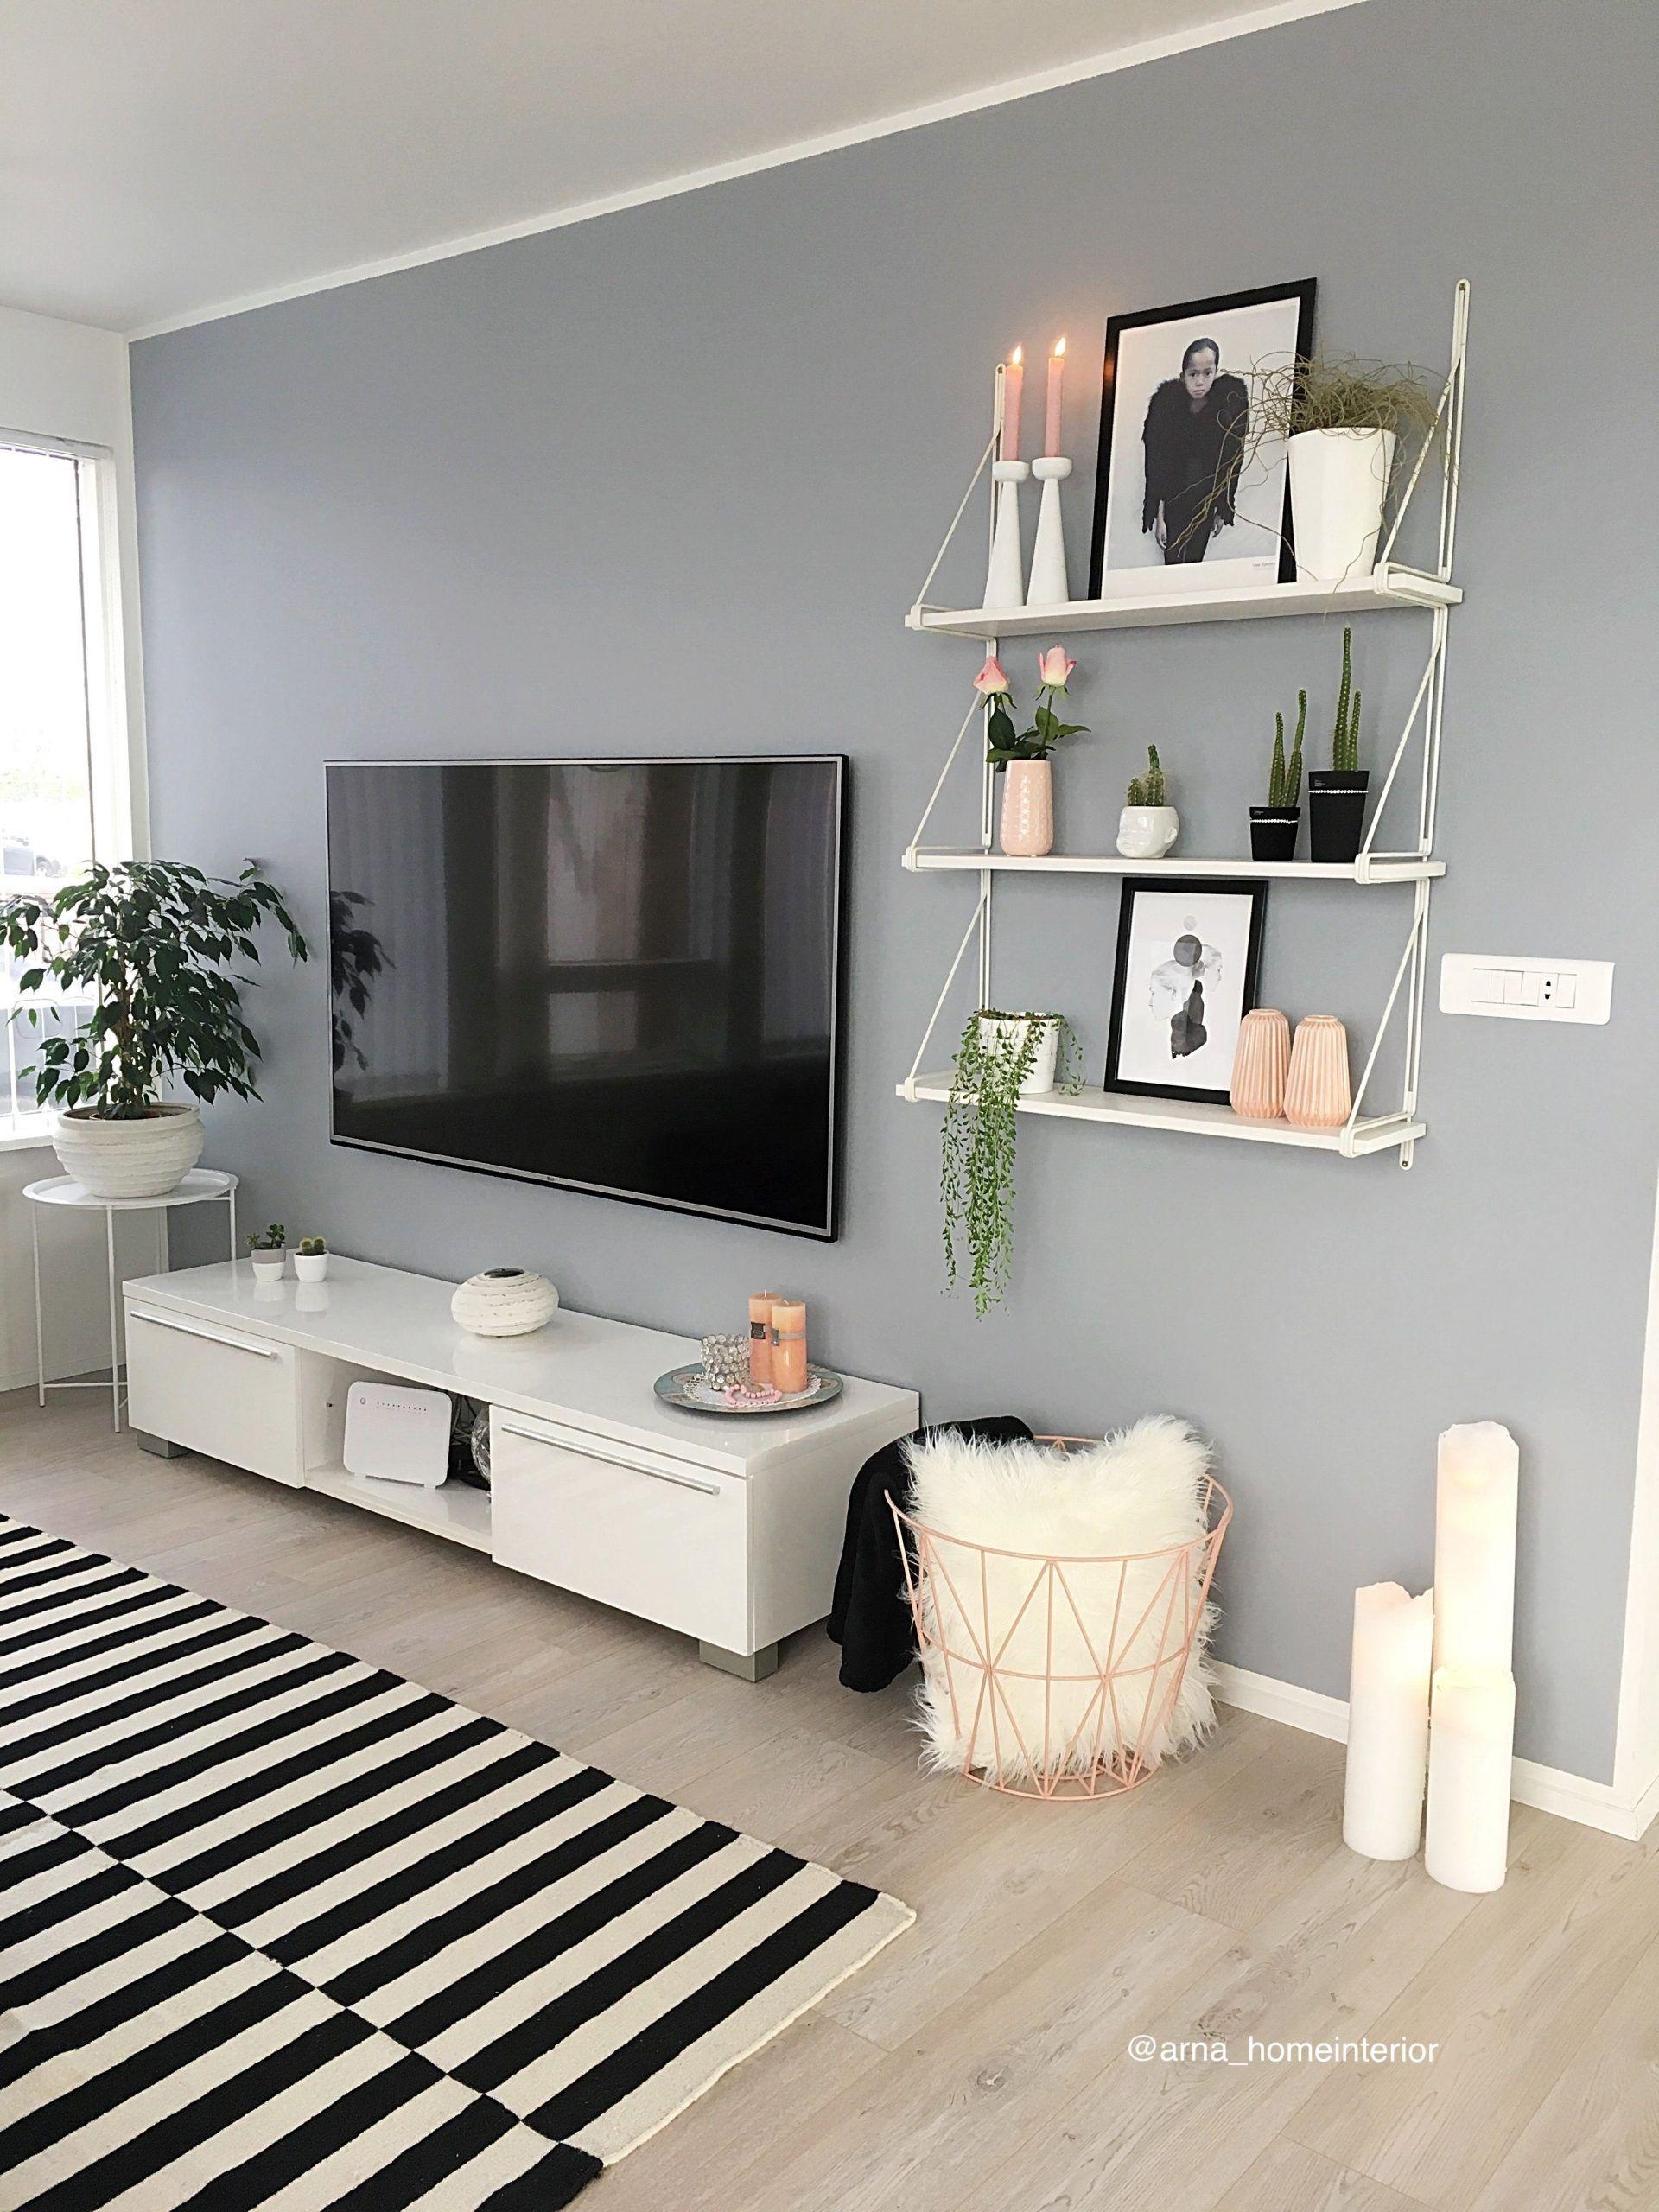 25 Elegant Interior Design Ideas For Living Room With Low Budget Living Room Decor Tips Apartment Living Room Design Living Room Decor Apartment